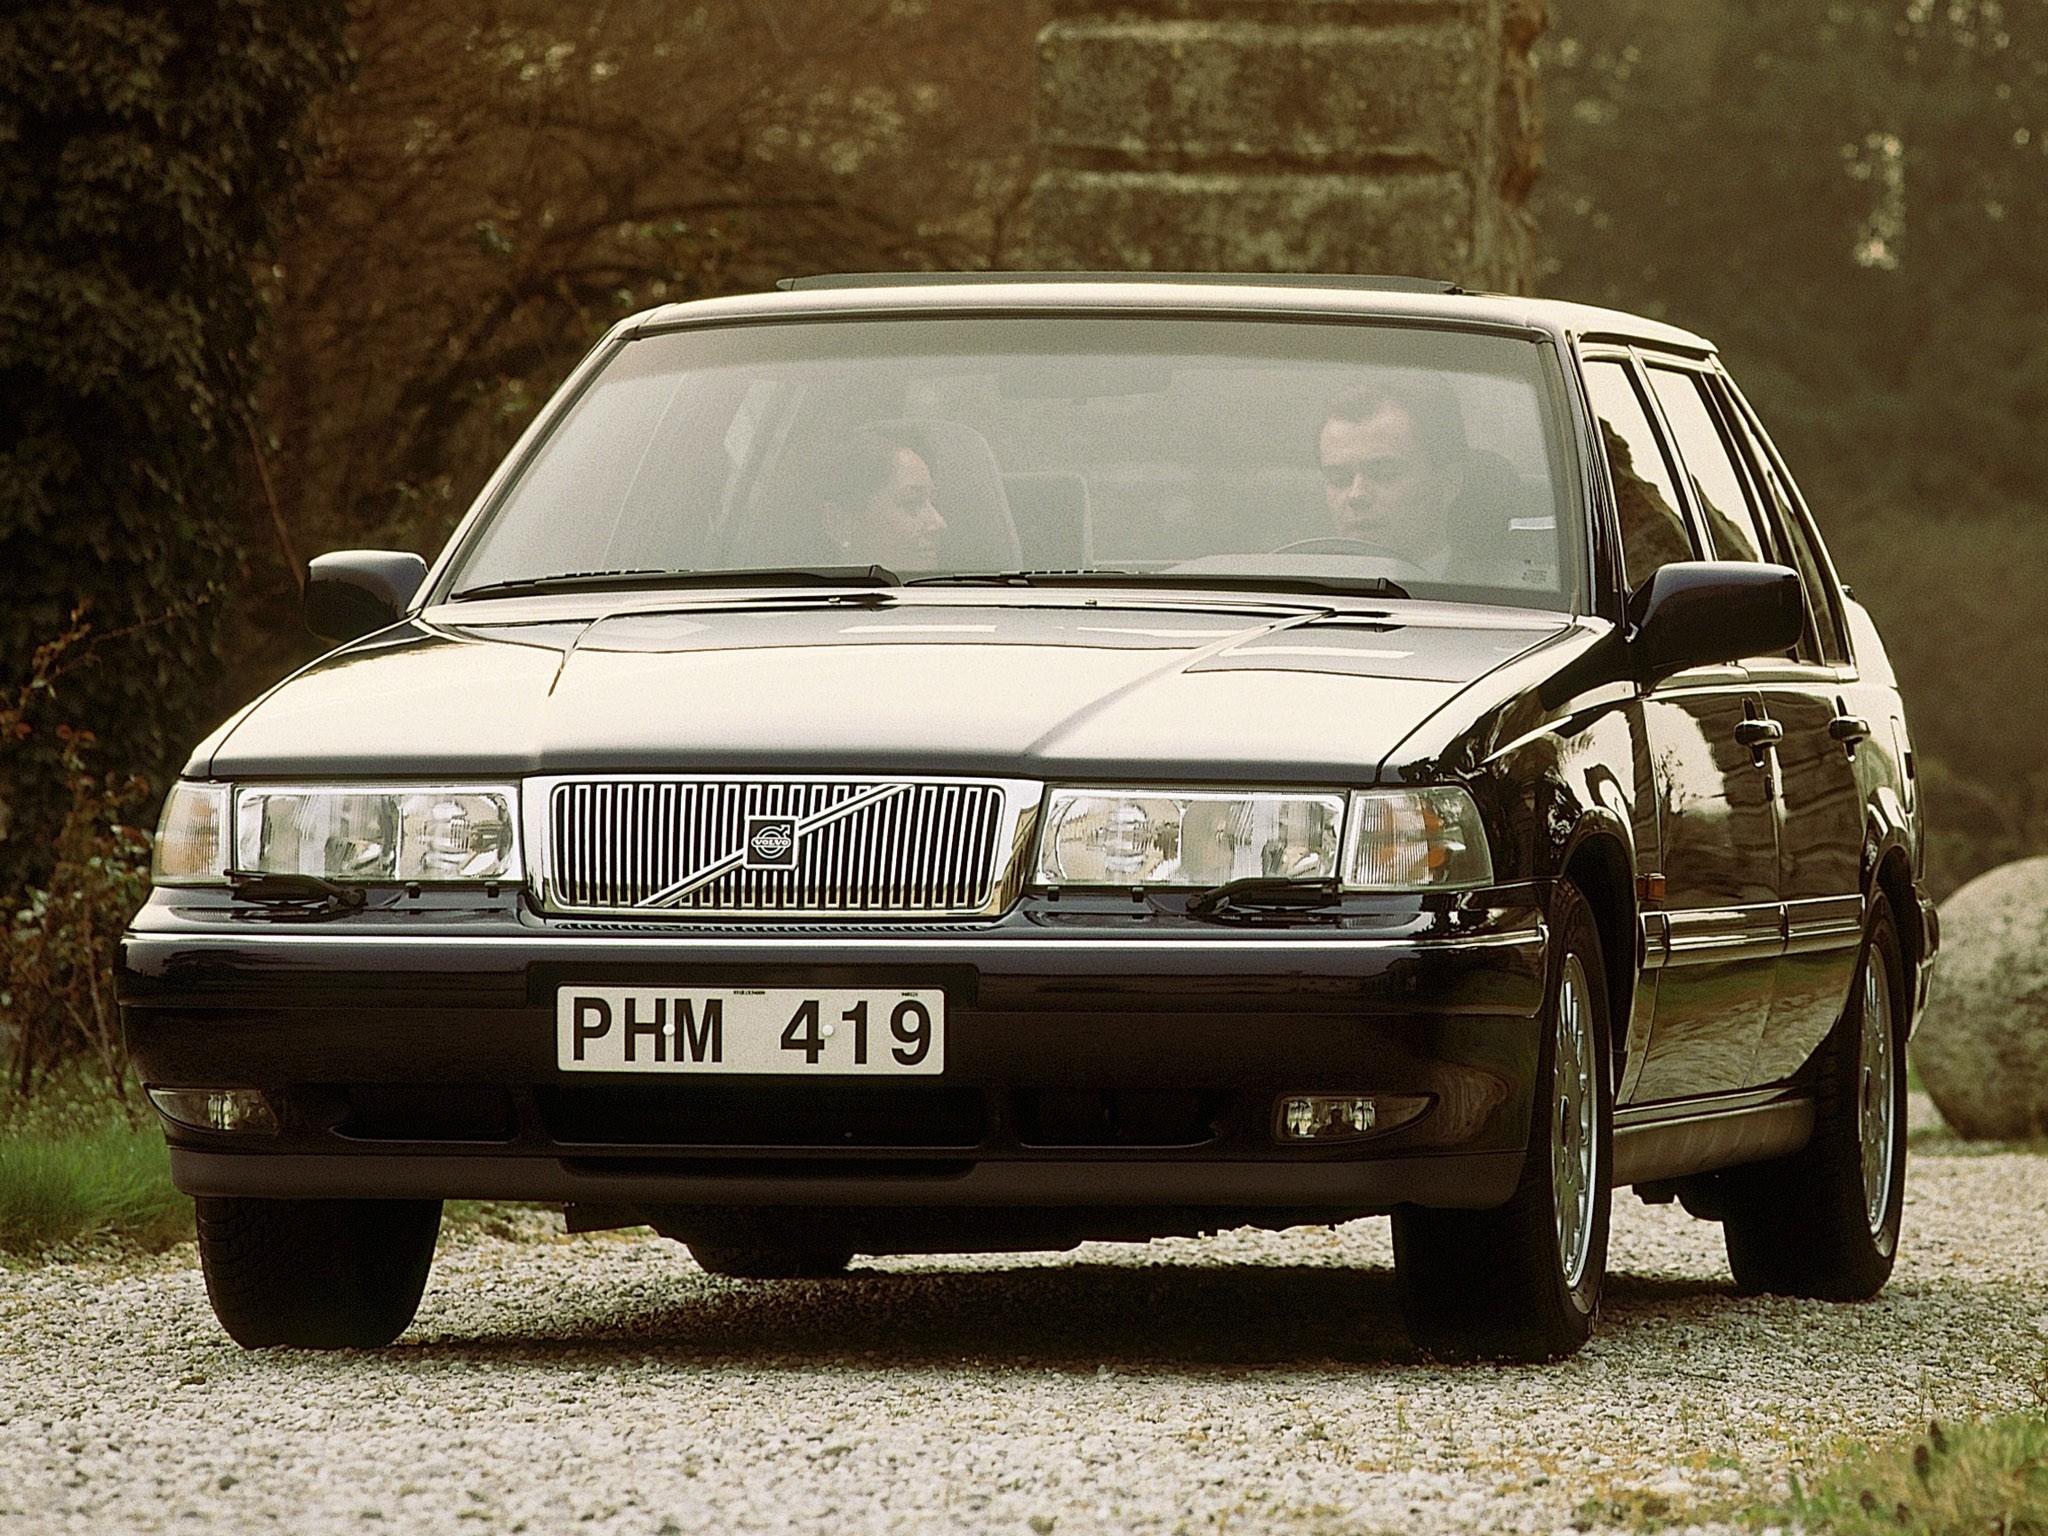 VOLVO 960 - 1994, 1995, 1996, 1997 - autoevolution